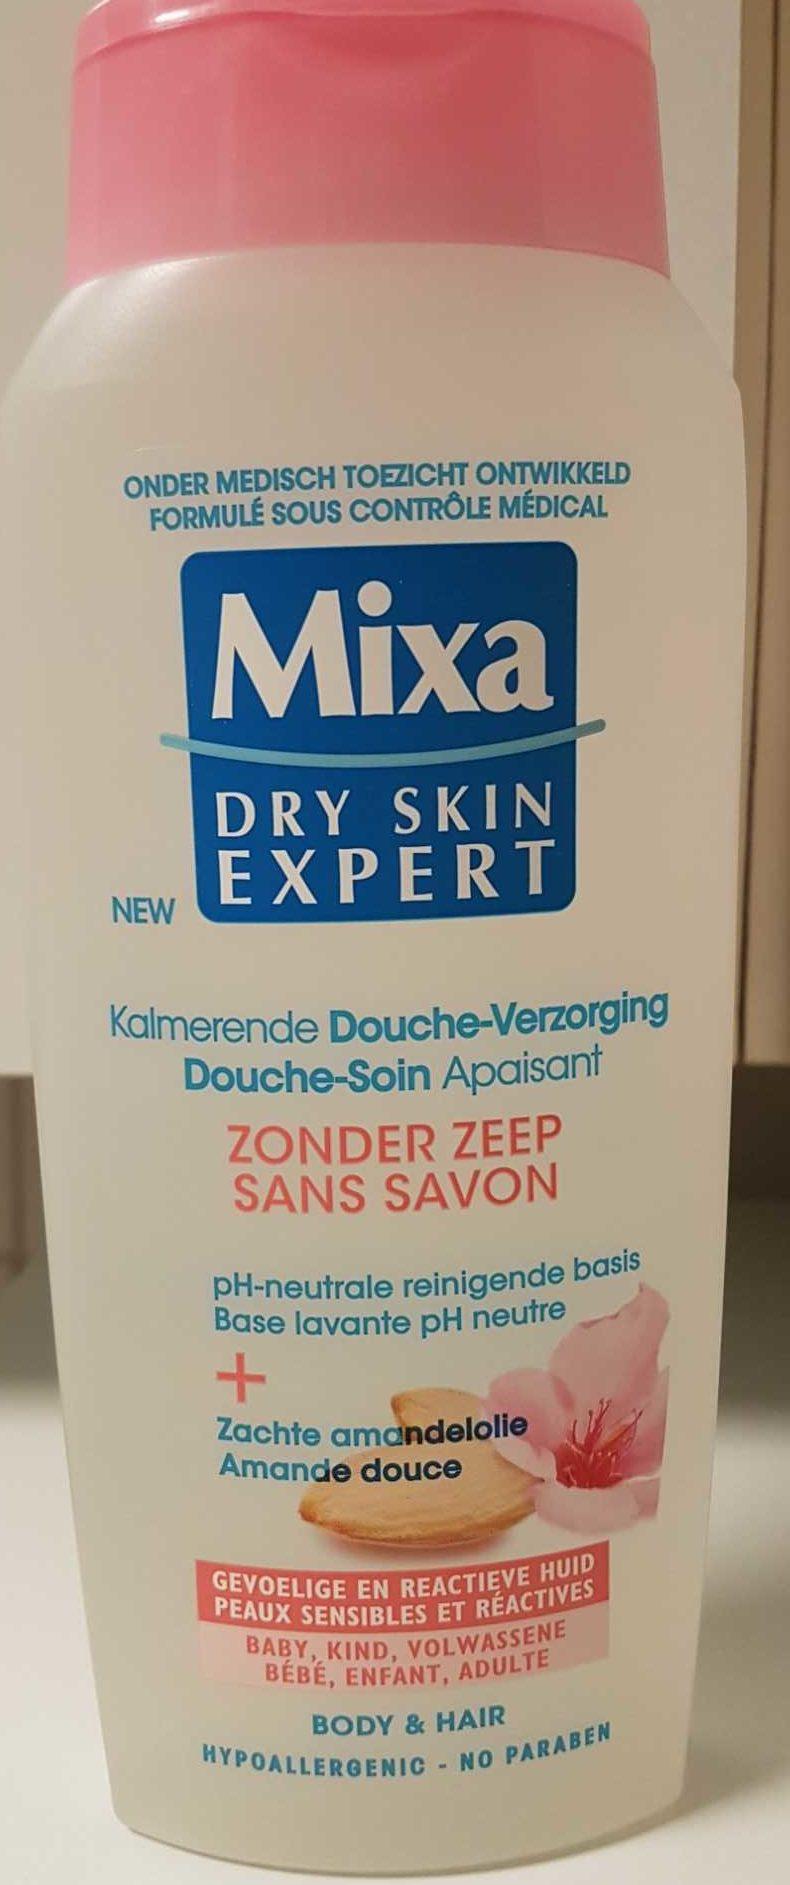 Mixa dry skin expert - Product